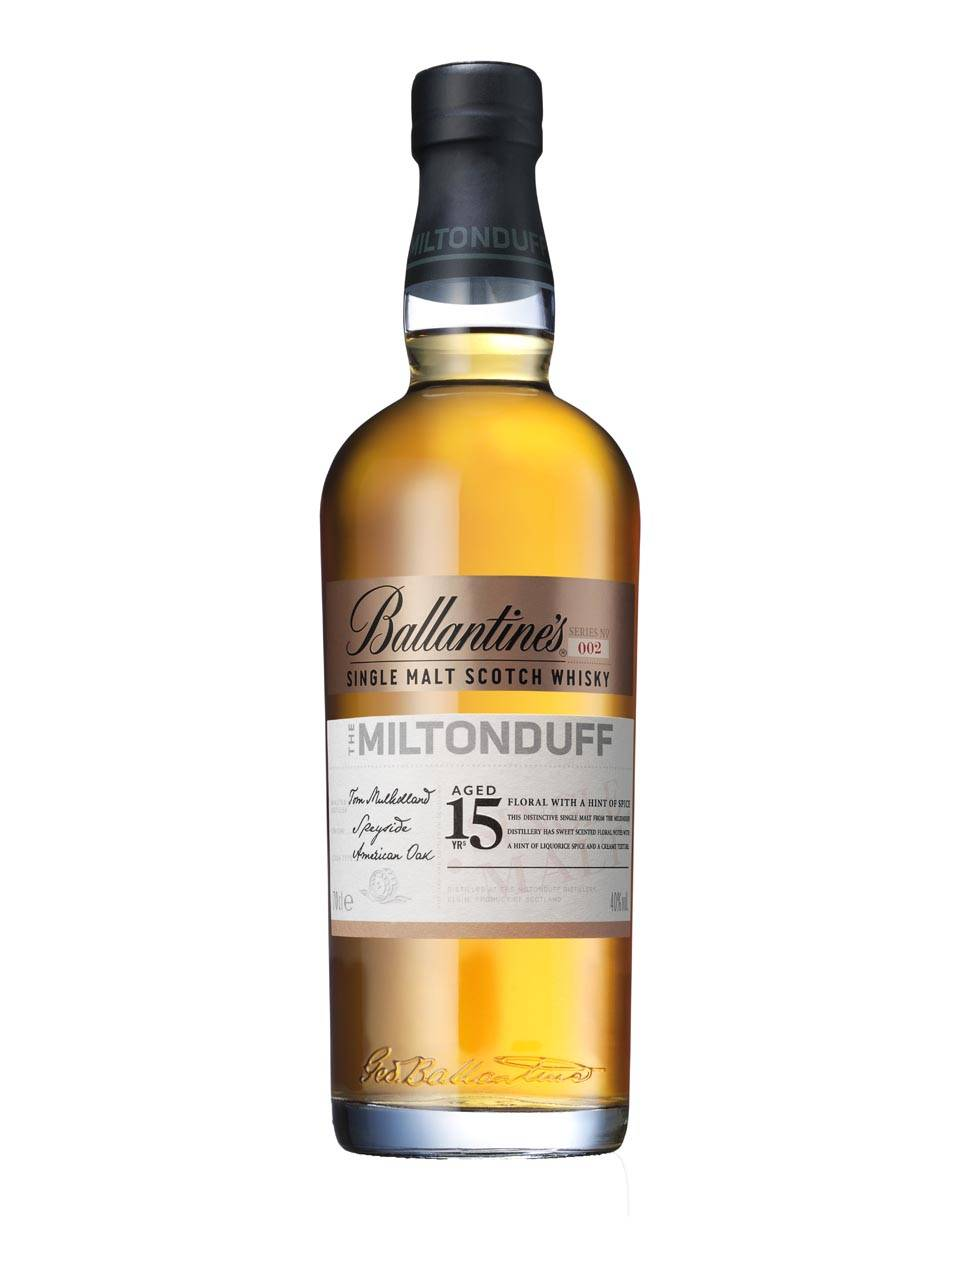 Whisky scotian, MILTONDUFF 15 YEARS OLD 700 Ml, Ballantine's